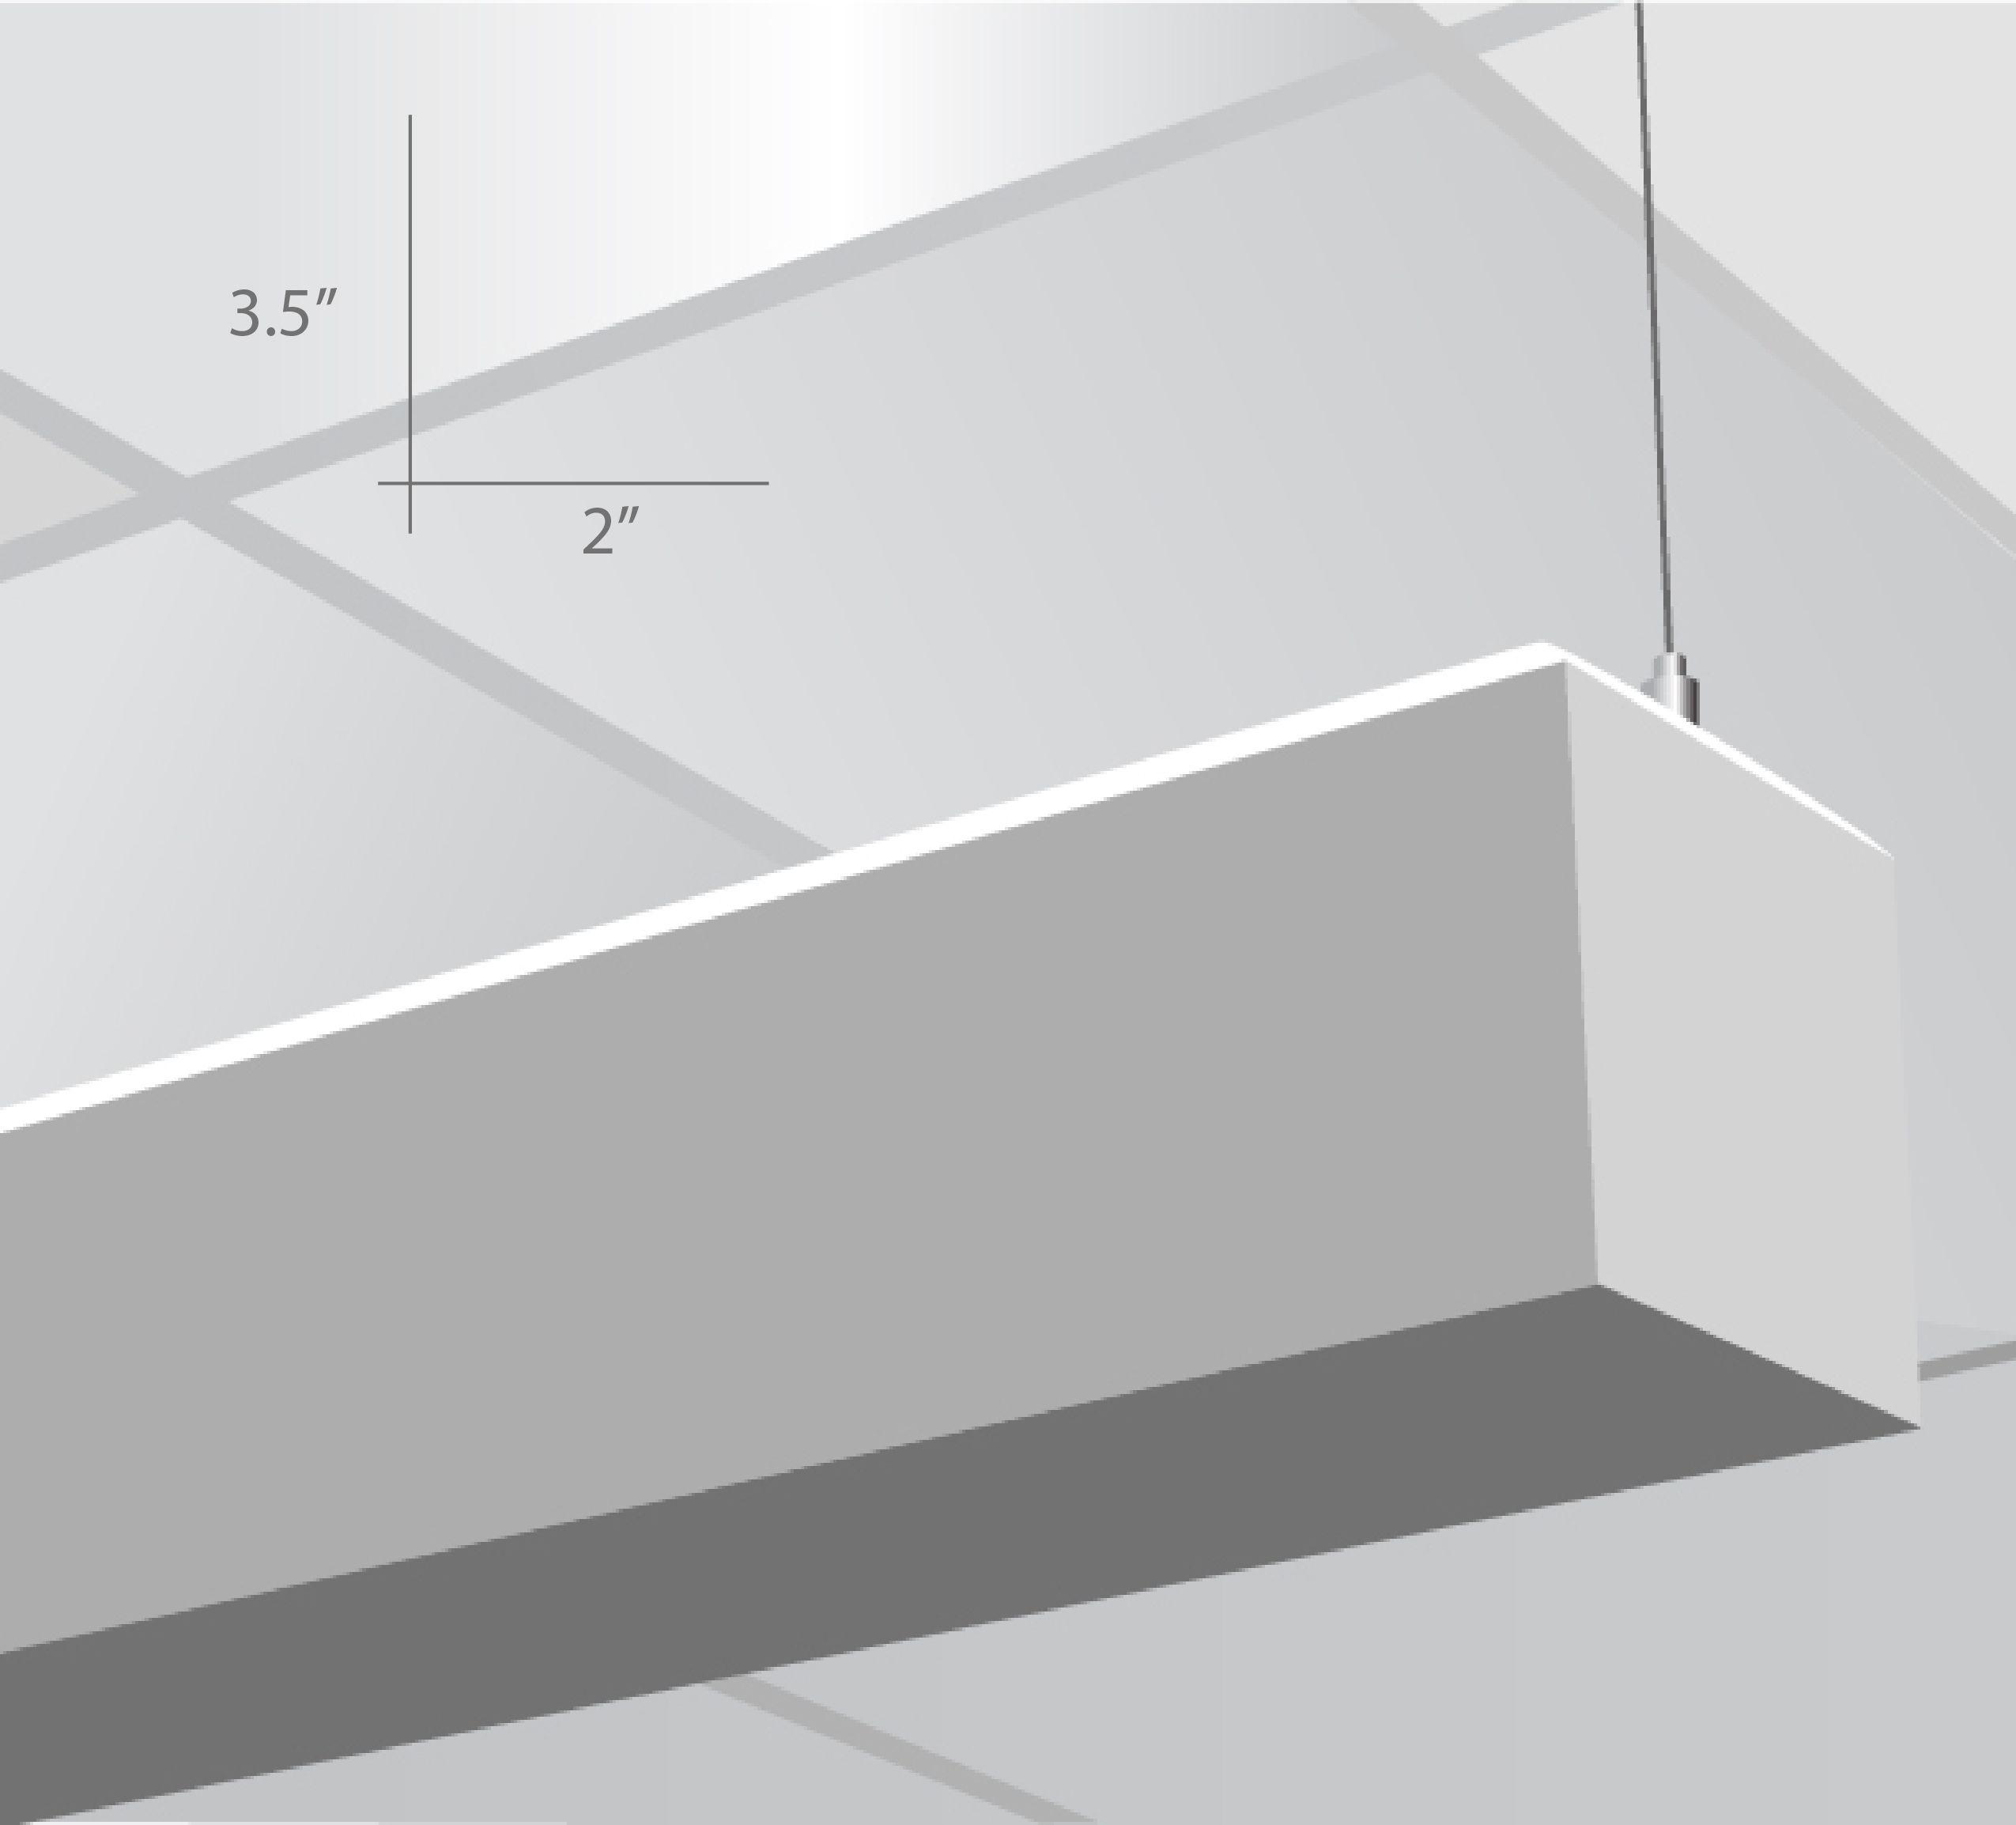 Led 0 10v Dimming Wiring Installation Wire Data Schema Diagram Downlight Alcon Lighting 12104 8 U Beam 23 Series Architectural 42 Cfl Ballast Diagrams Lutron